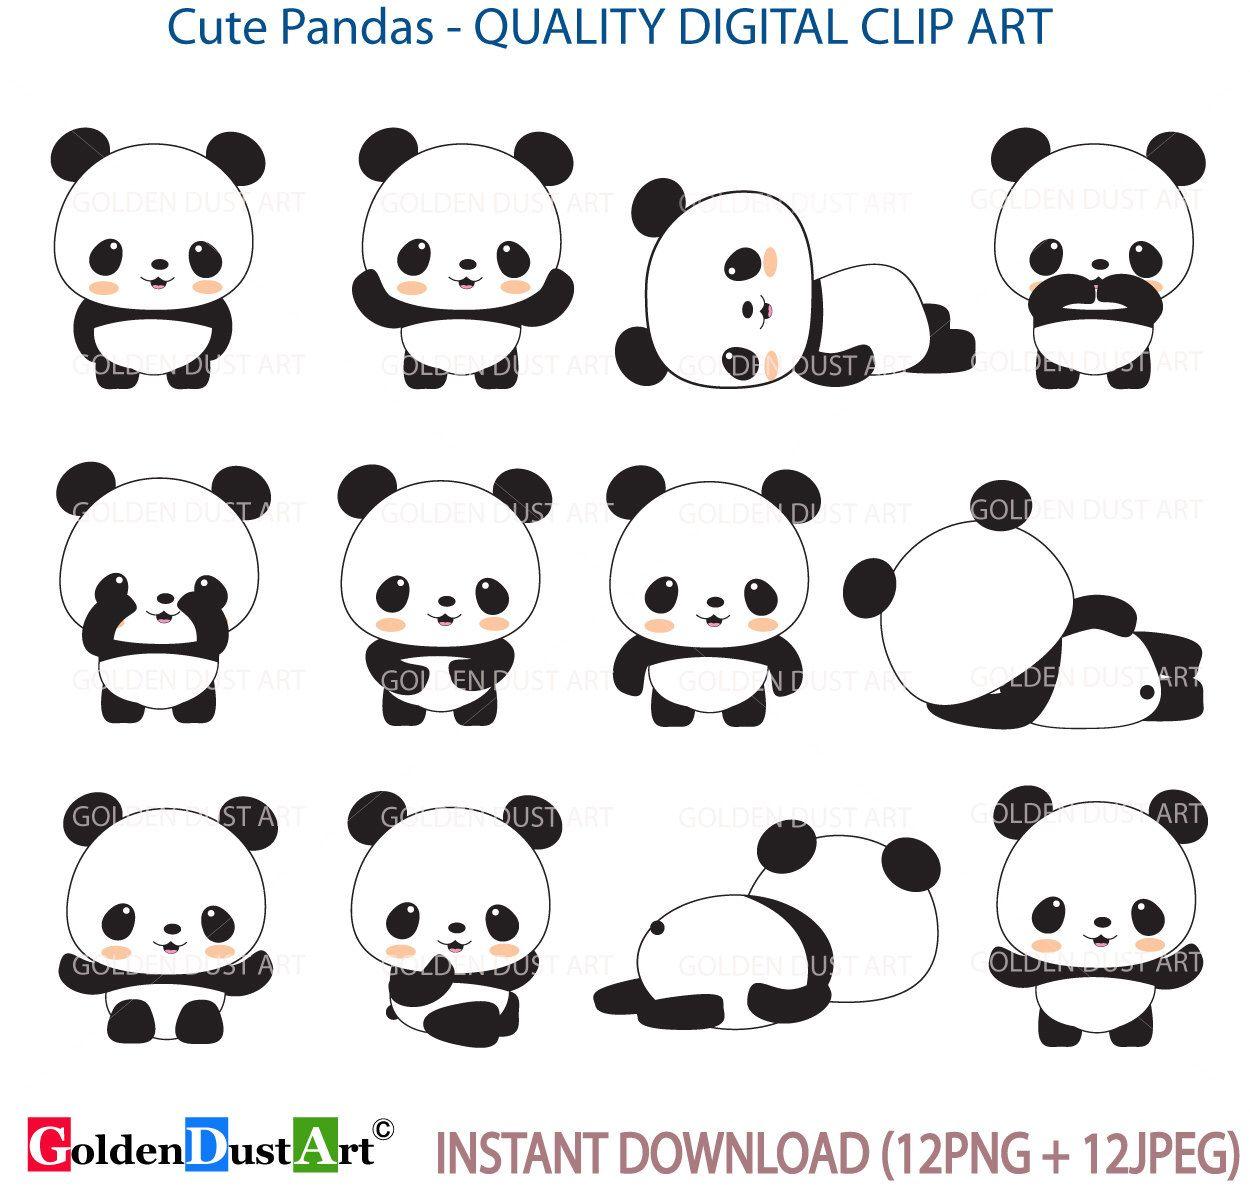 Panda Clip Art Panda Clip Art Panda Clipart Cute Panda Etsy Cute Panda Kawaii Panda Panda